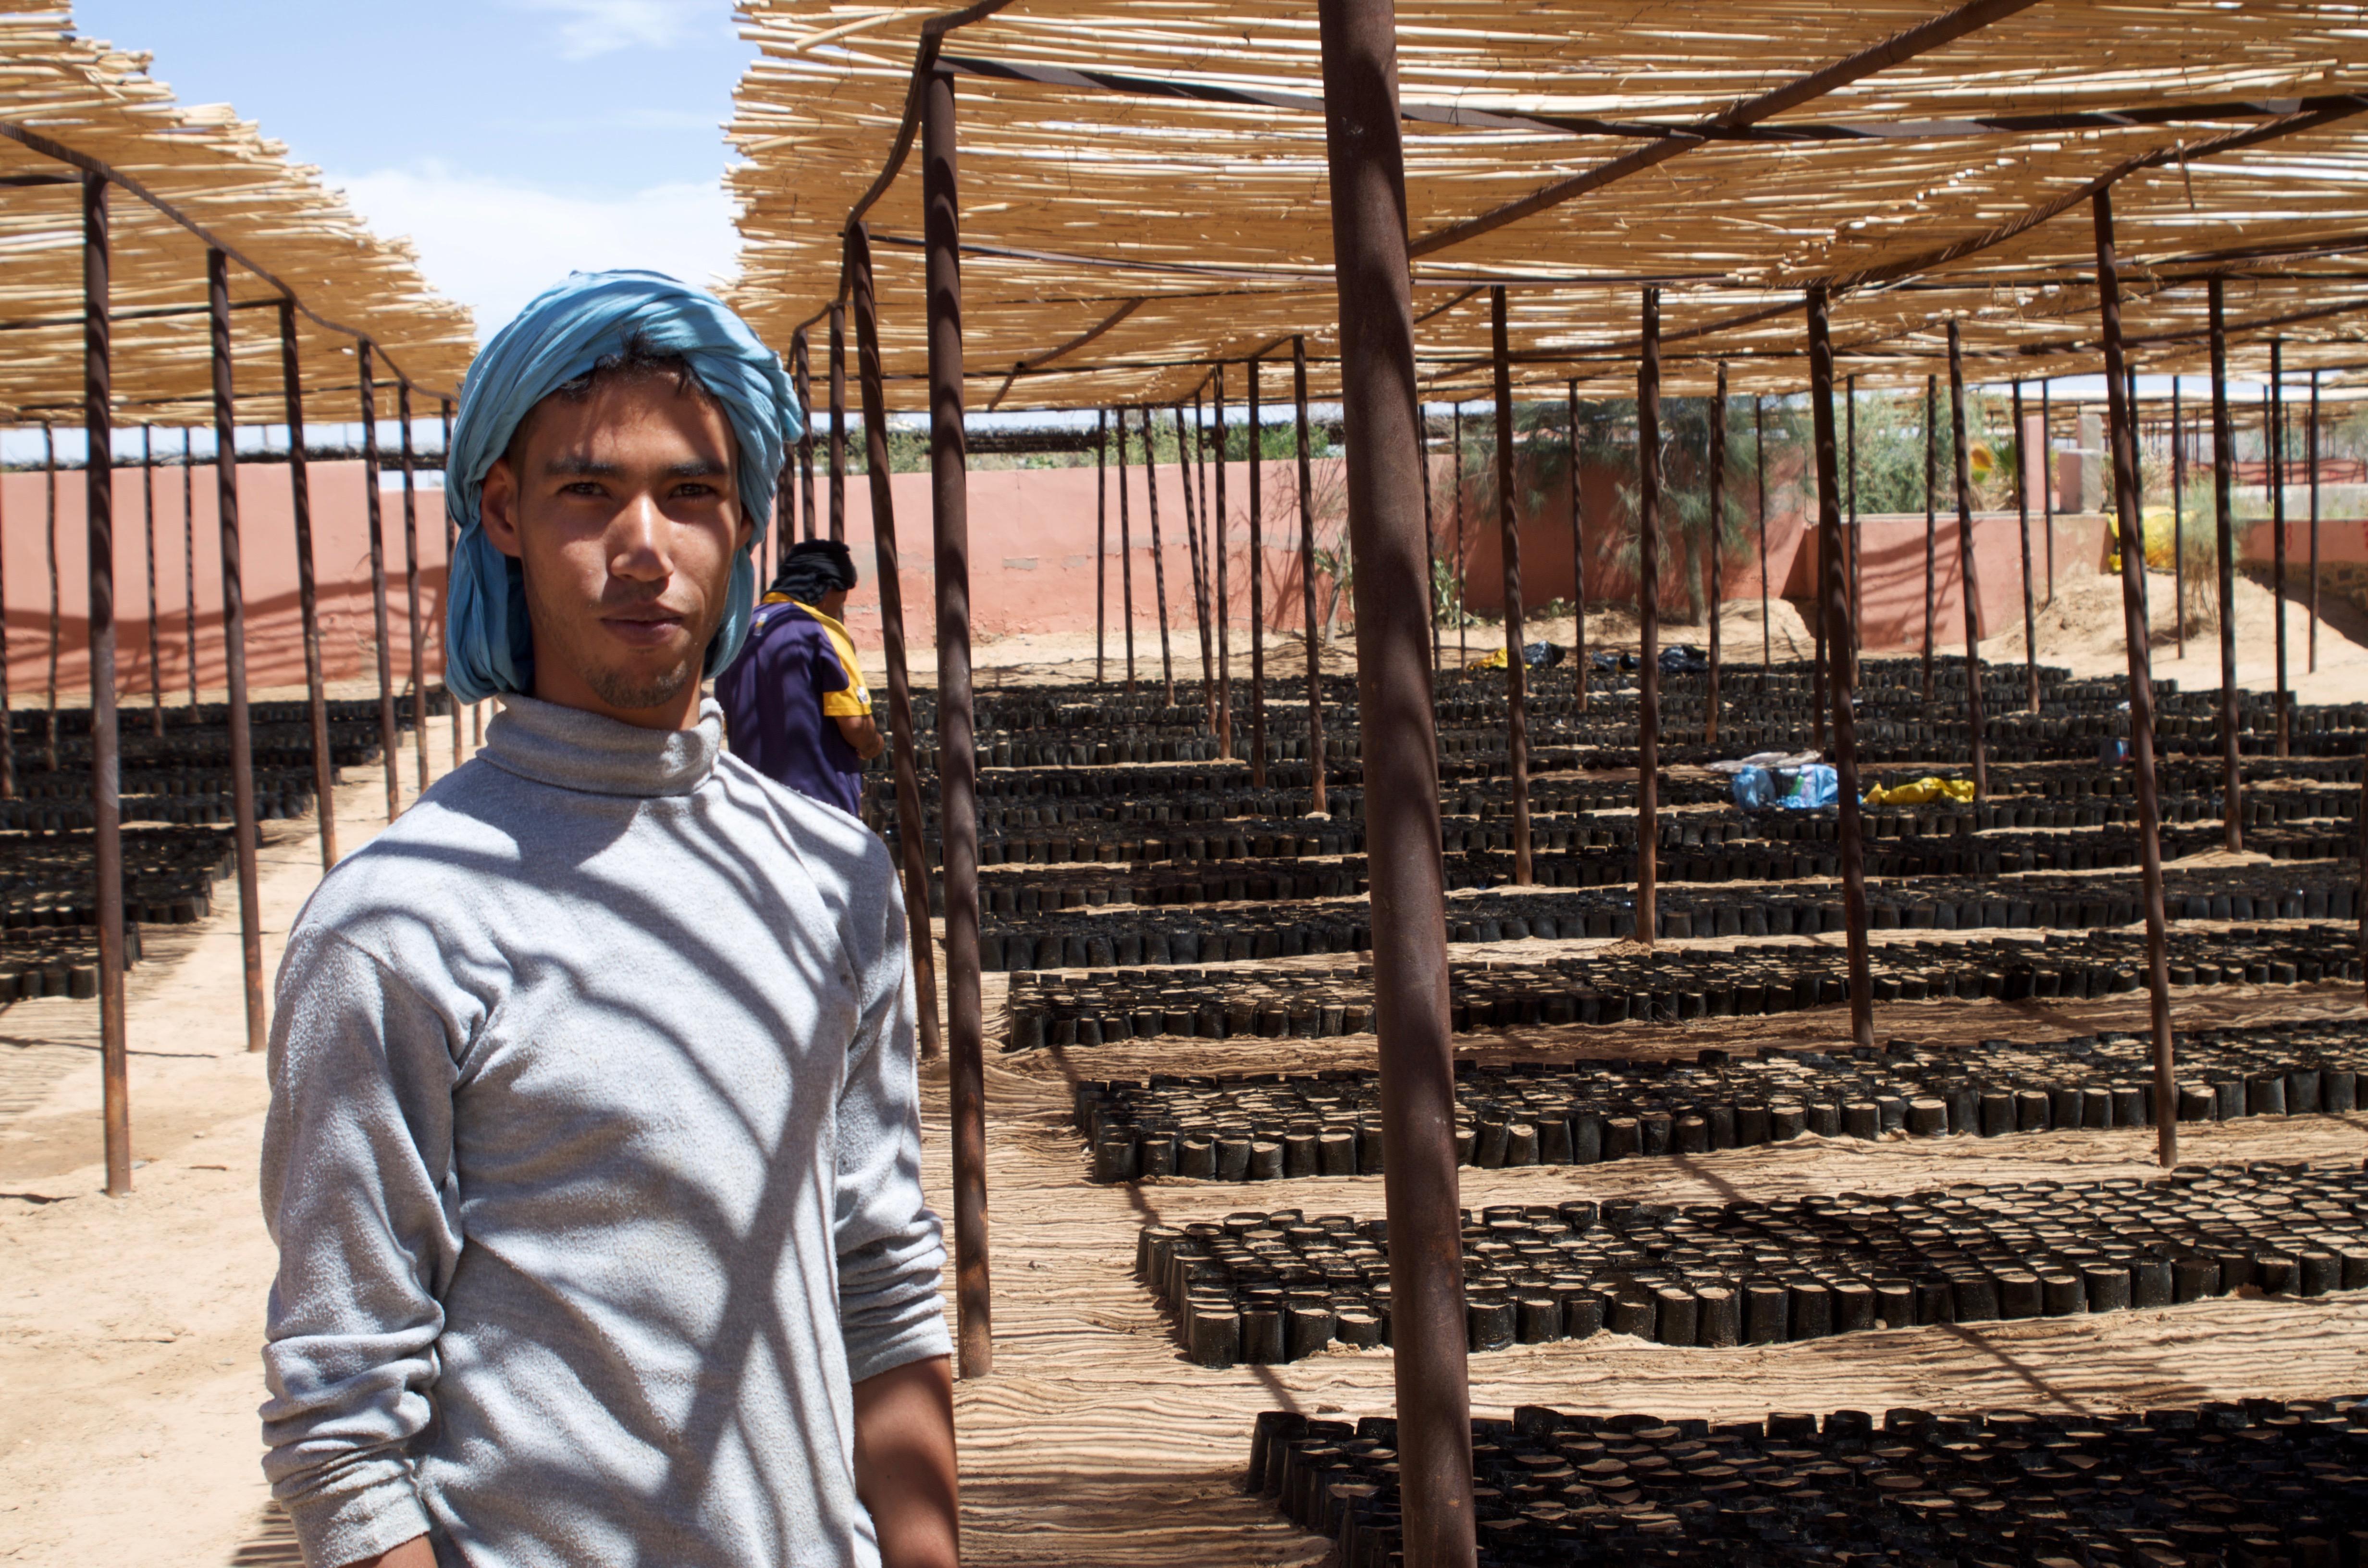 A Sahrawi farmer in Smara city.